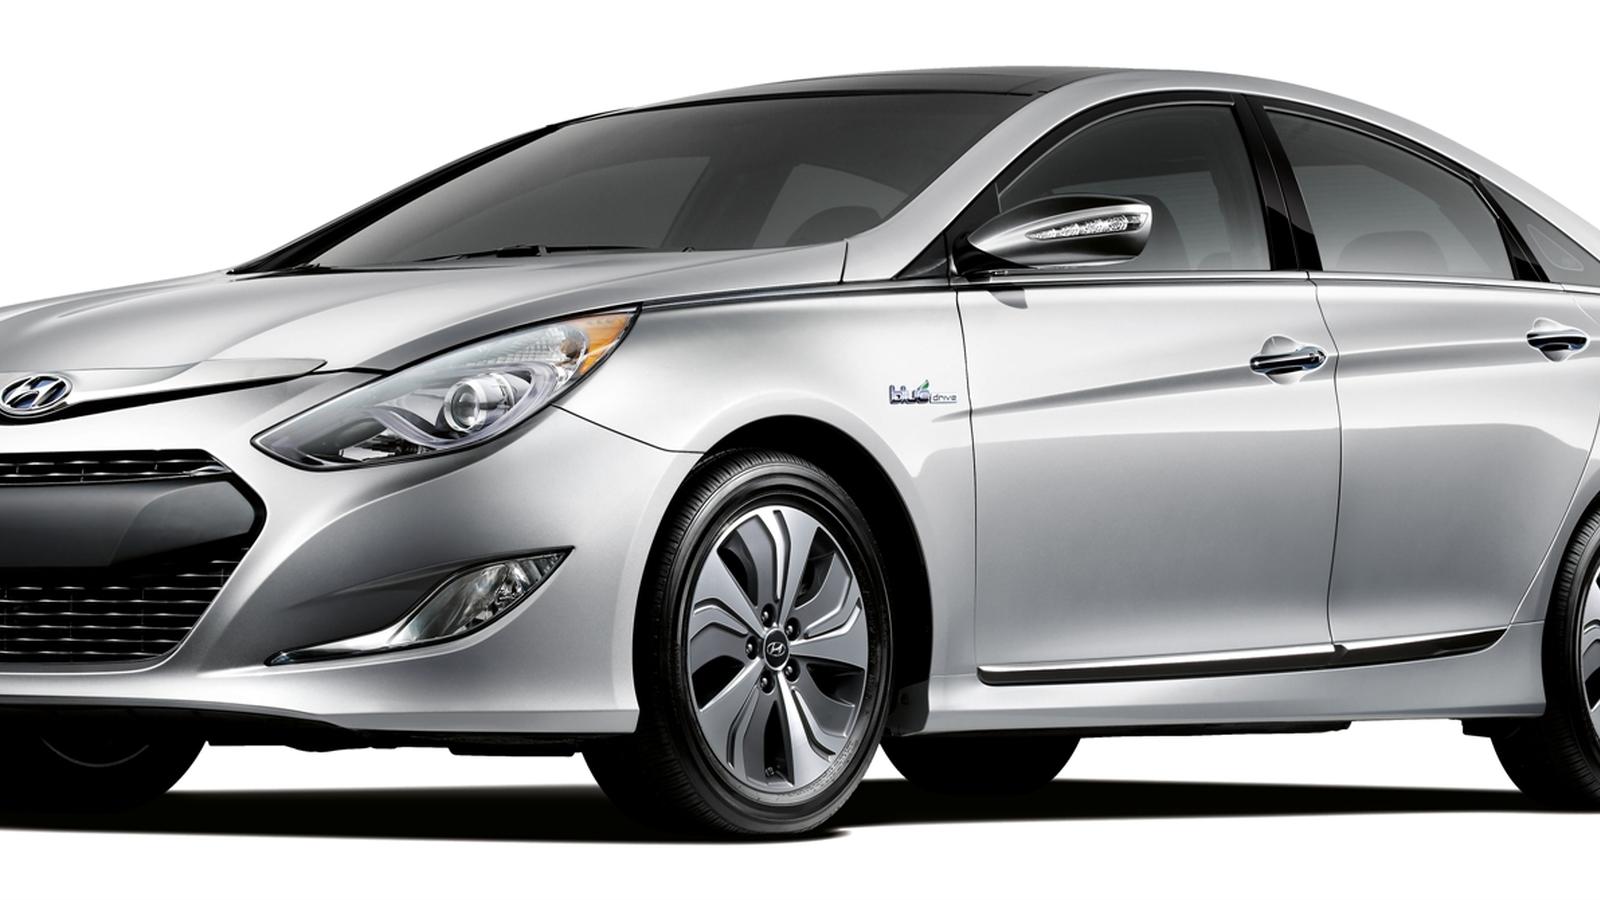 2013 Hyundai Sonata Starter Location